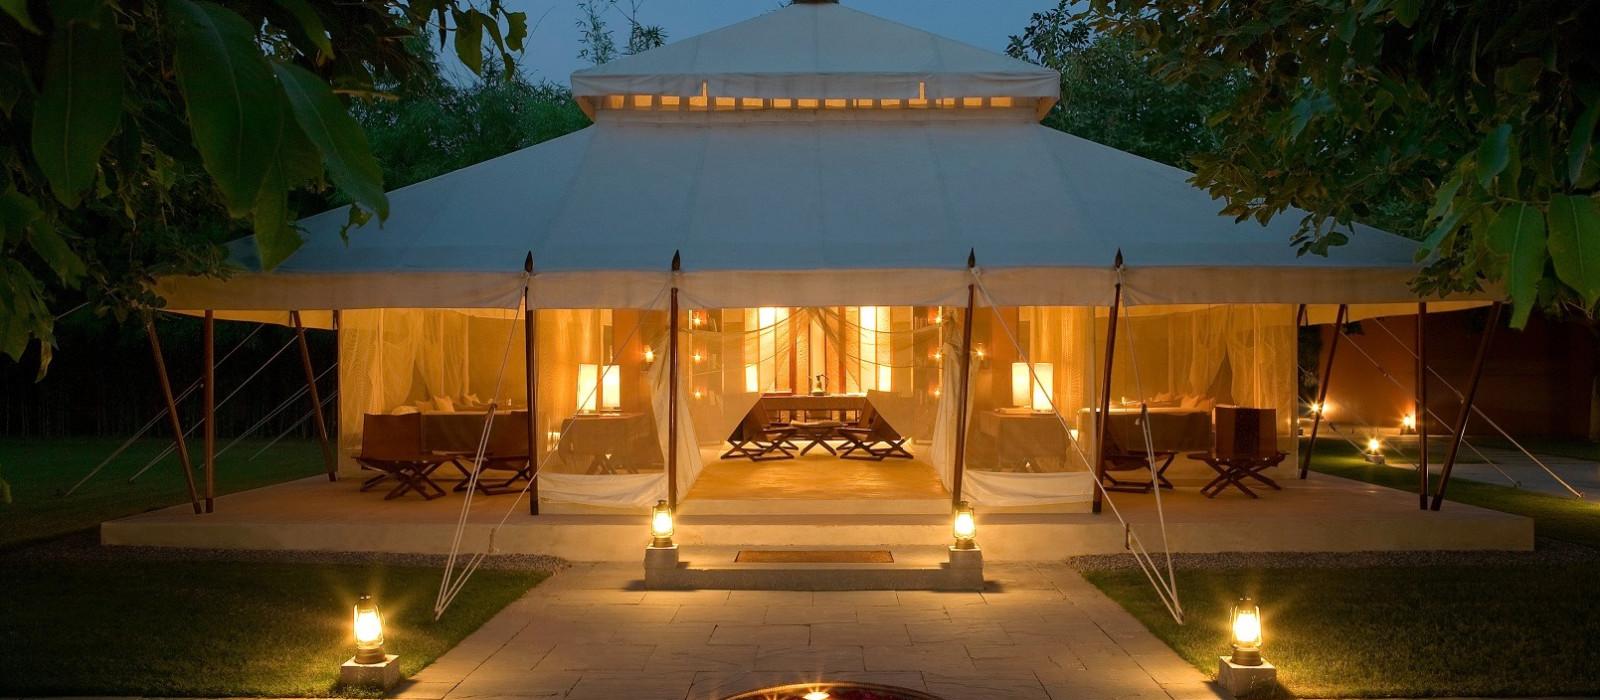 Hotel Aman-i-Khas Nordindien